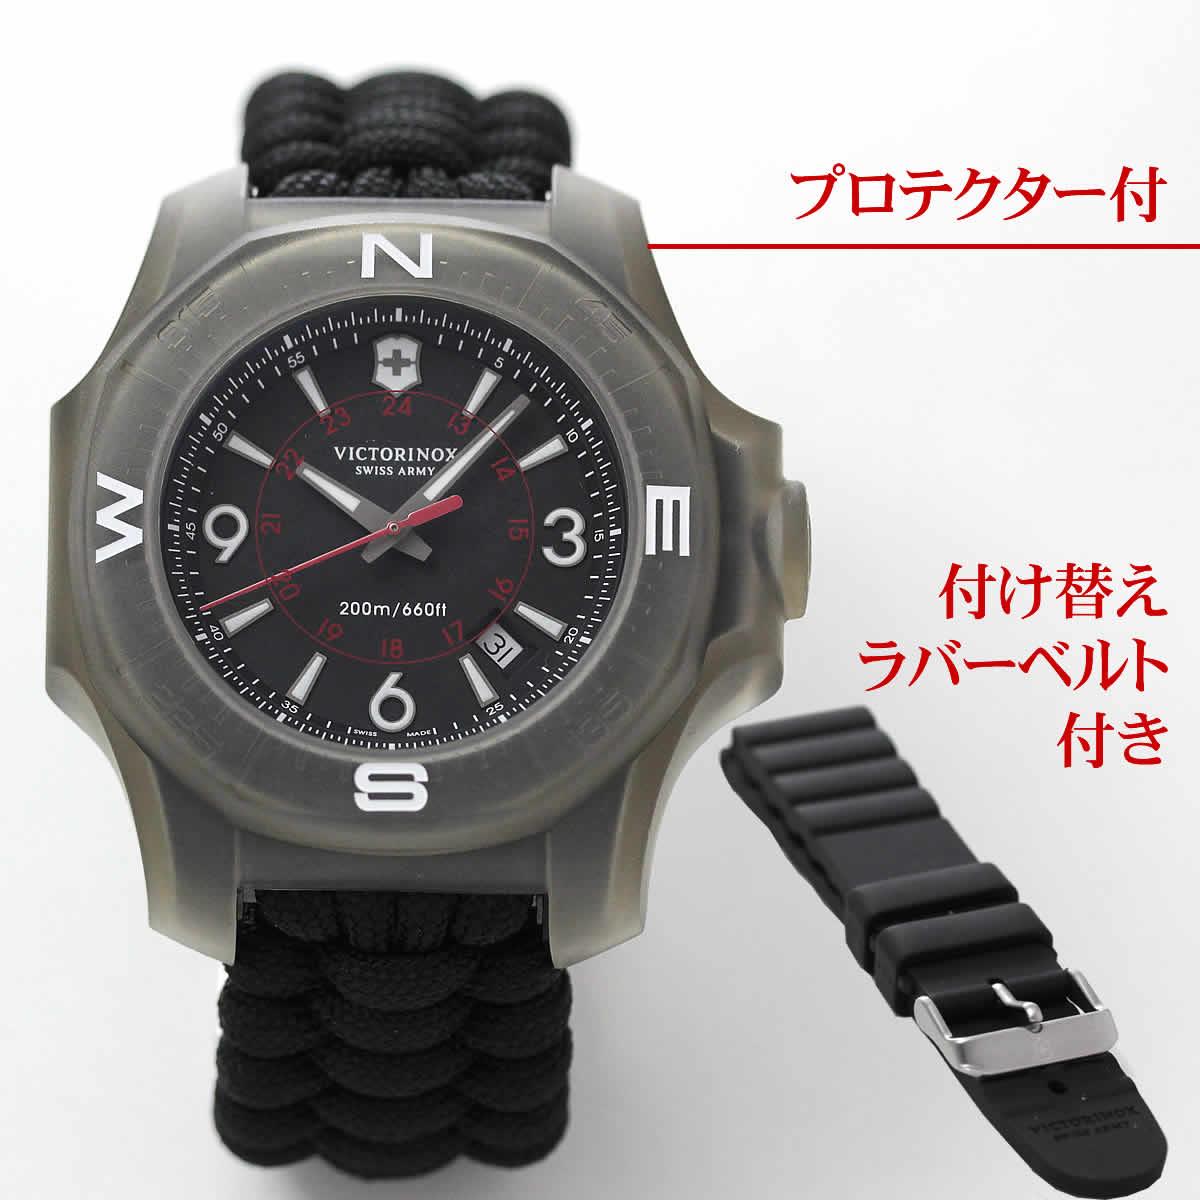 Victorinox Swissarmy 腕時計 INOX